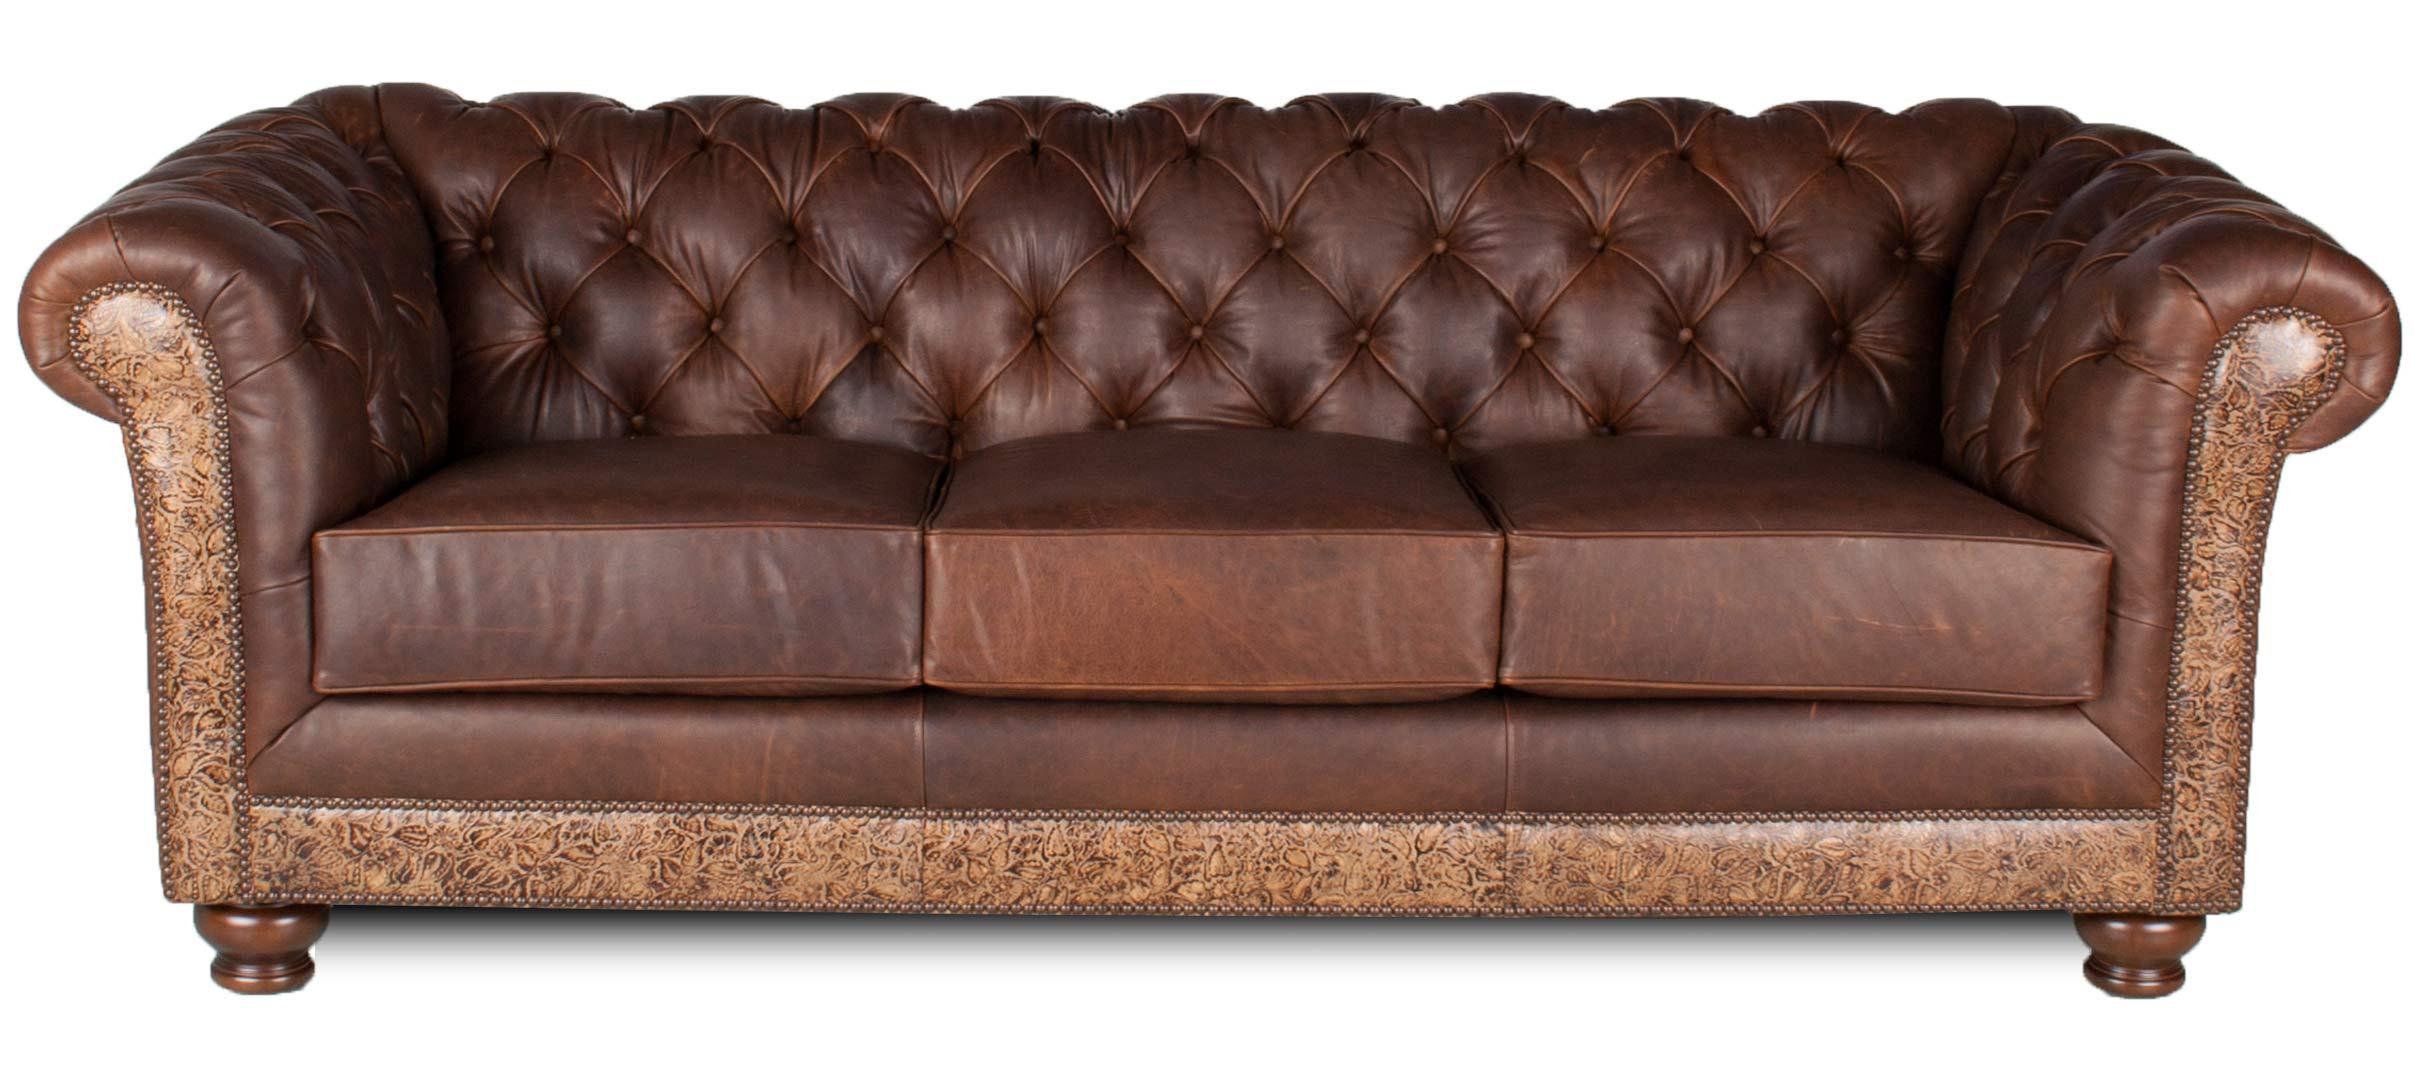 executive - leather furniture CRZFZSK